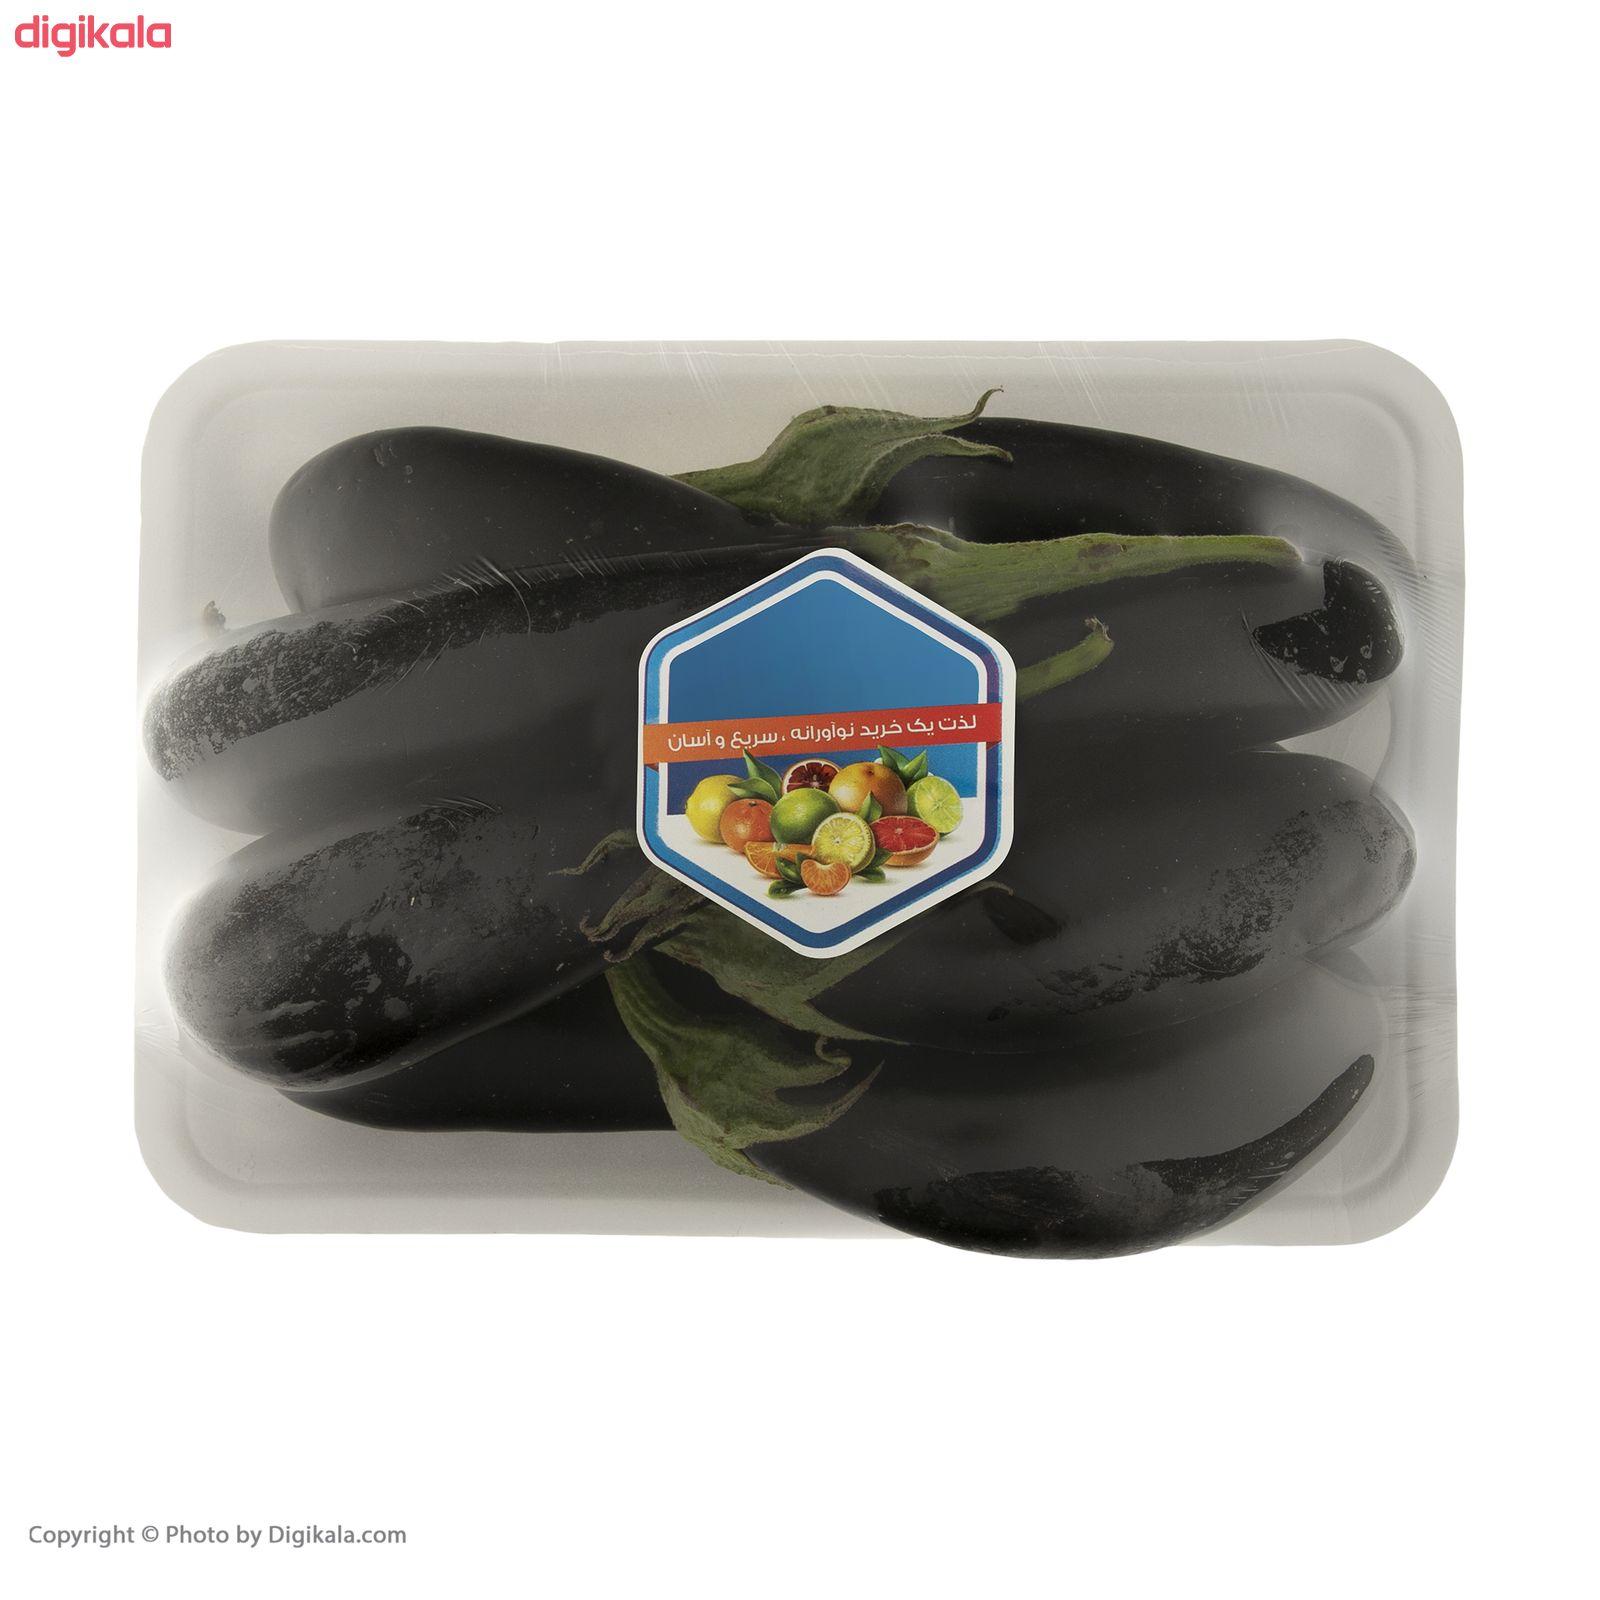 بادمجان میوه پلاس - 1 کیلوگرم main 1 4